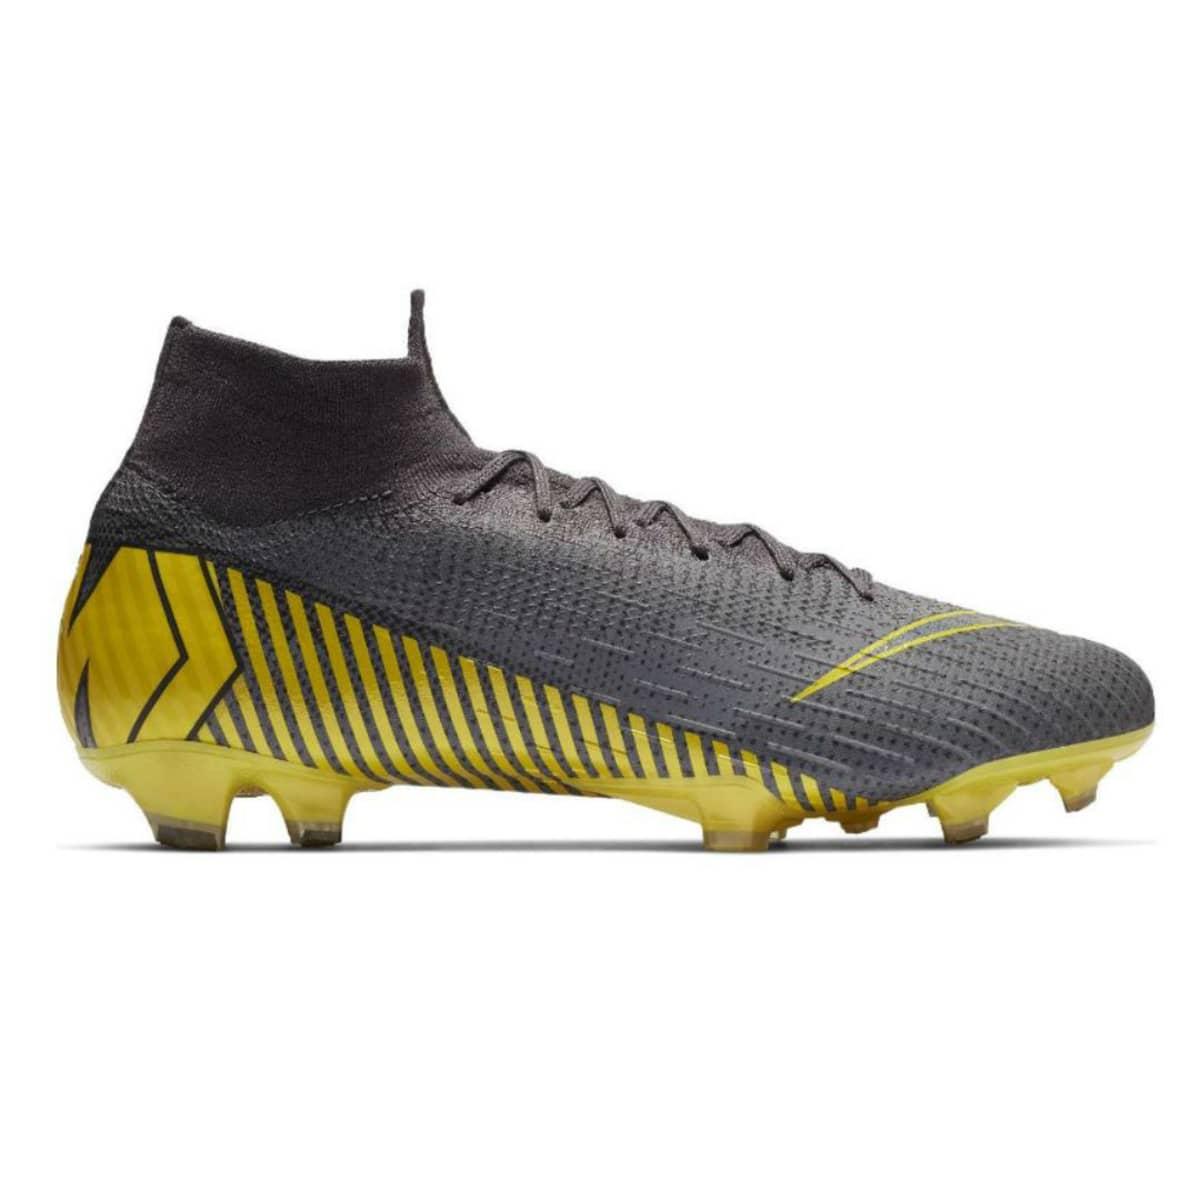 686f56f9472 Soccer